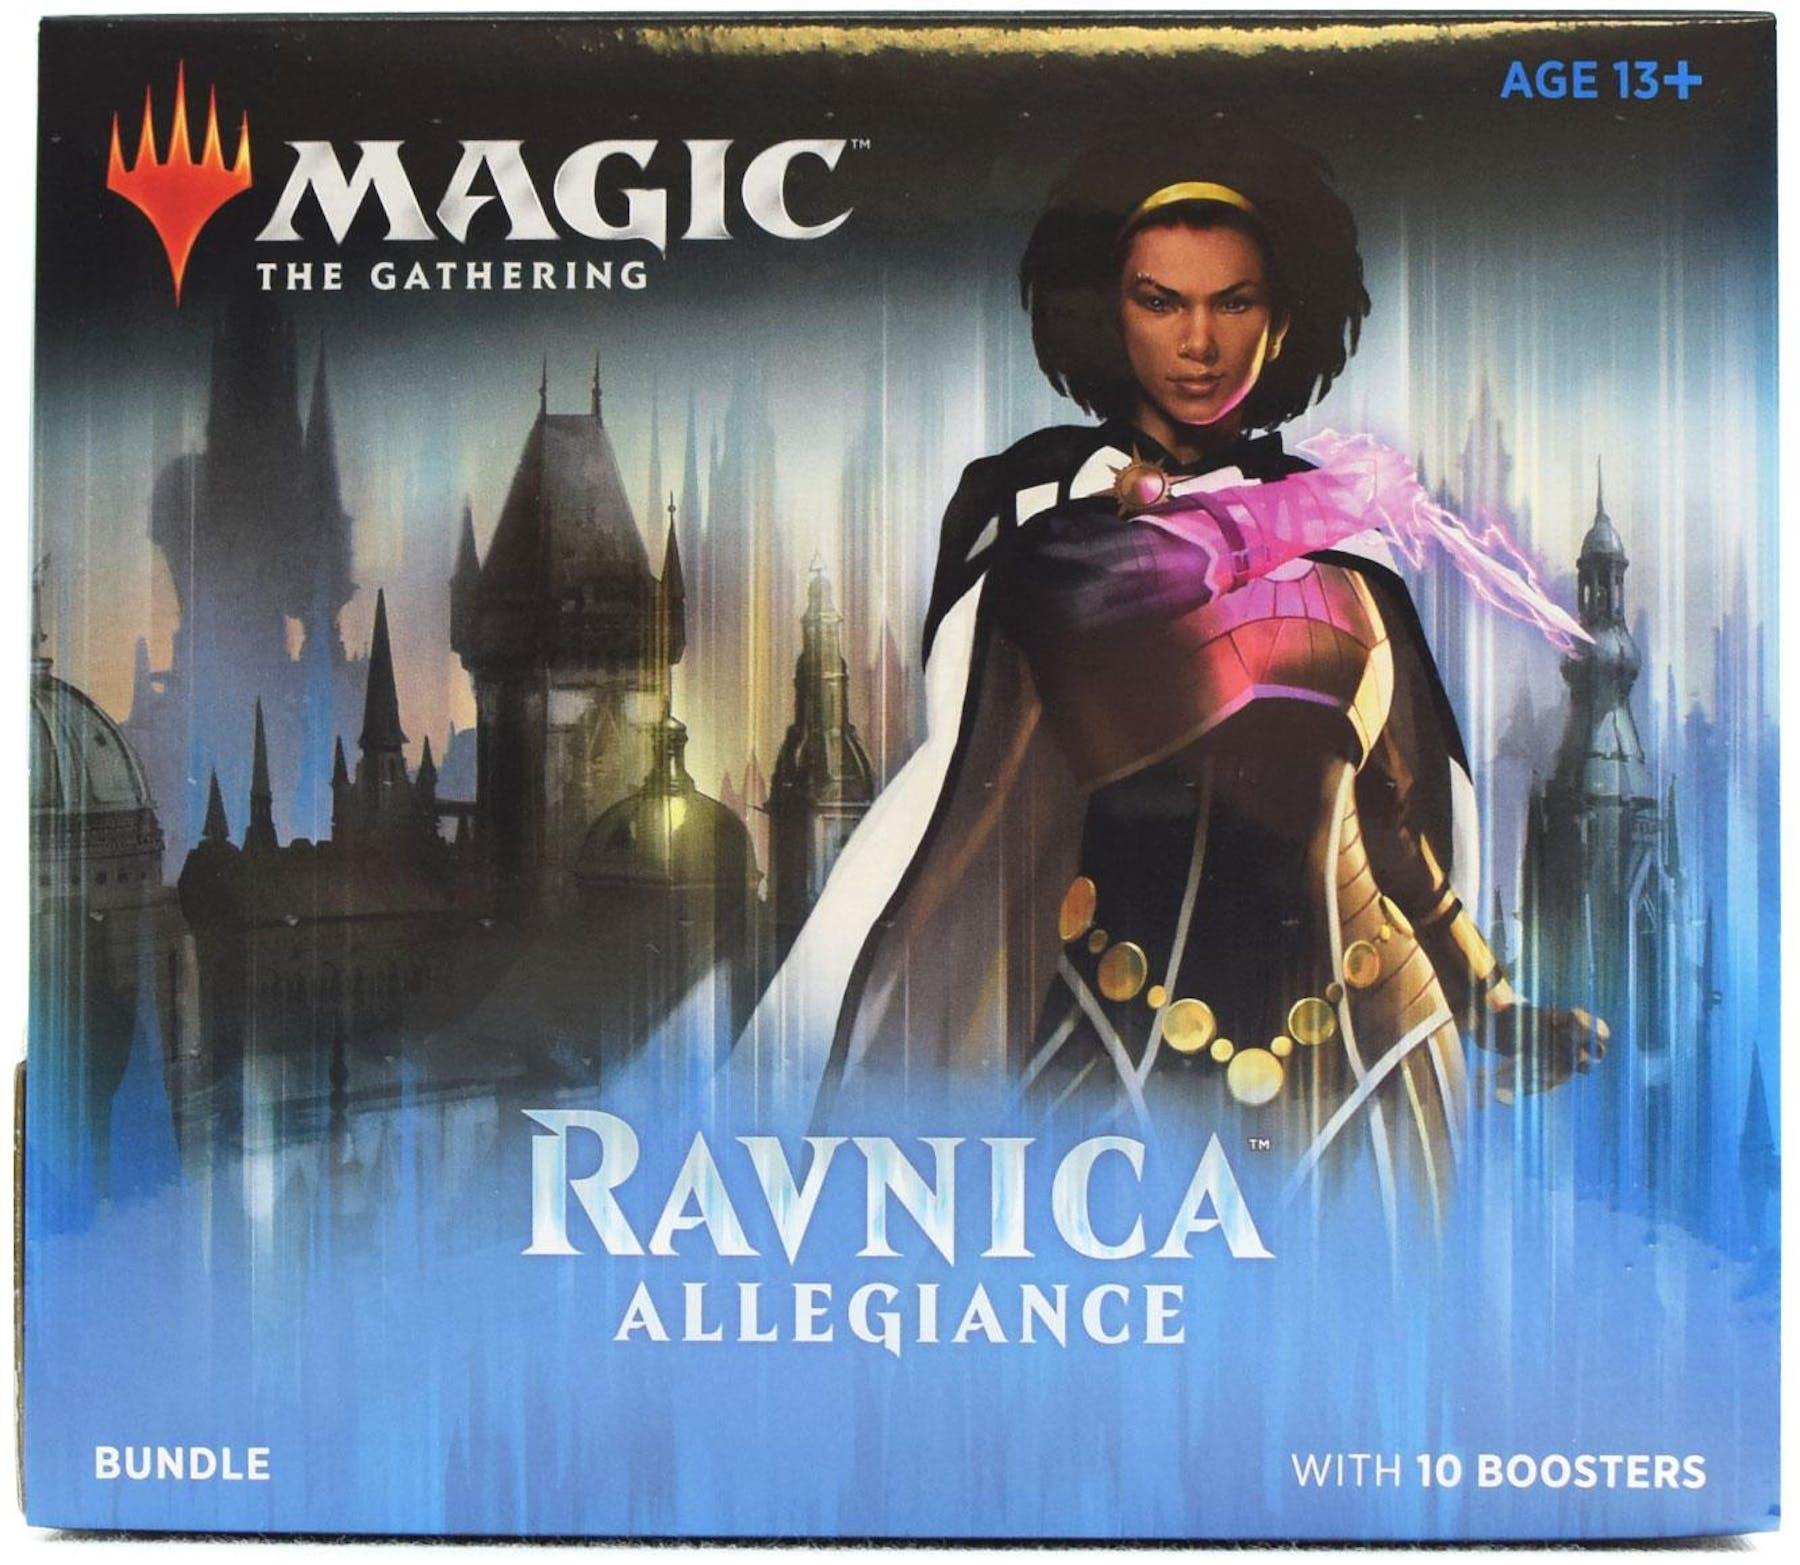 Magic The Gathering Ravnica Allegiance Bundle 6-Box Case